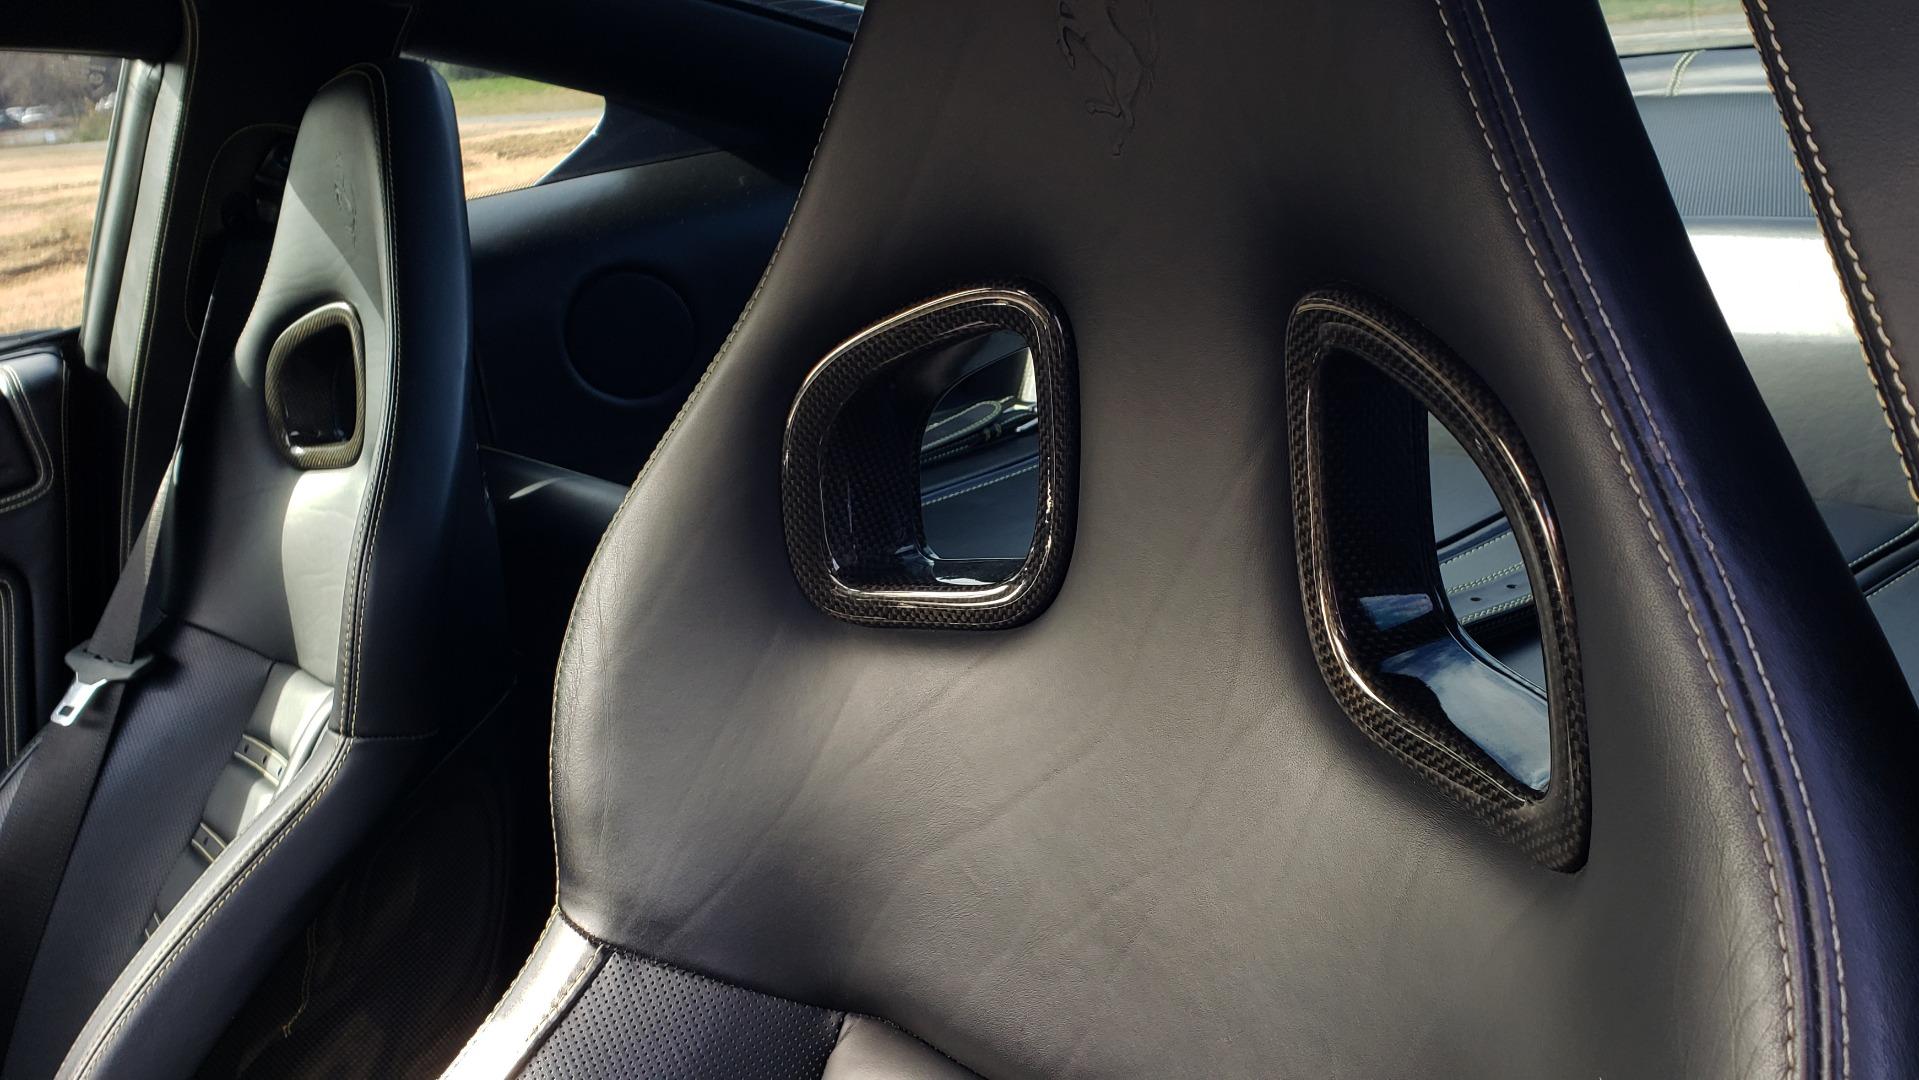 Used 2007 Ferrari 599 GTB FIORANO HGTE / V12 / F1 TRANS / NAV / BOSE / CUSTOM WHEELS for sale $109,999 at Formula Imports in Charlotte NC 28227 86